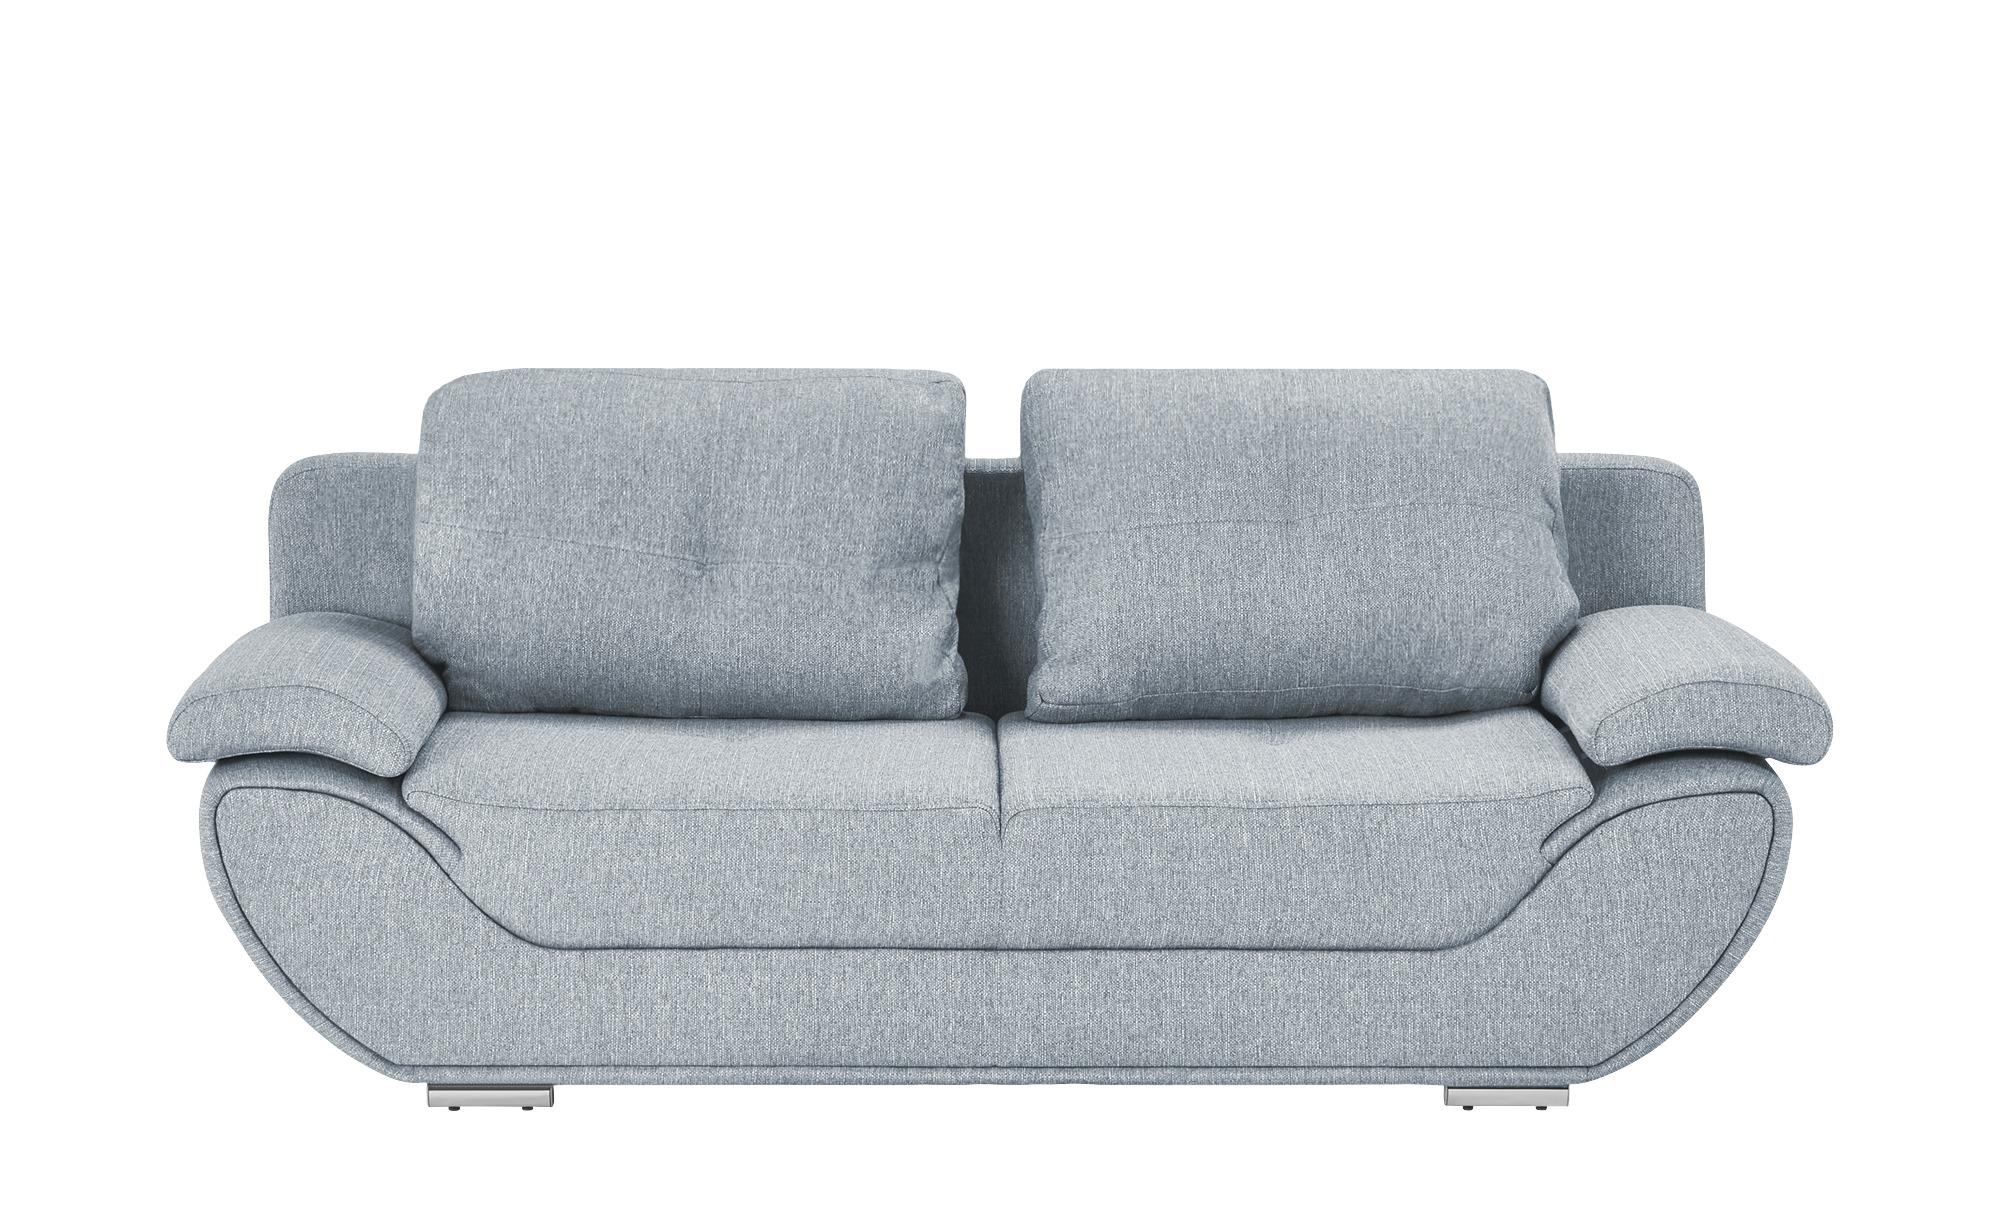 smart Design-Schlafsofa grau - Webstoff Adina ¦ silber ¦ Maße (cm): B: 204 H: 90 T: 92 Polstermöbel > Sofas > 2-Sitzer - Höffner